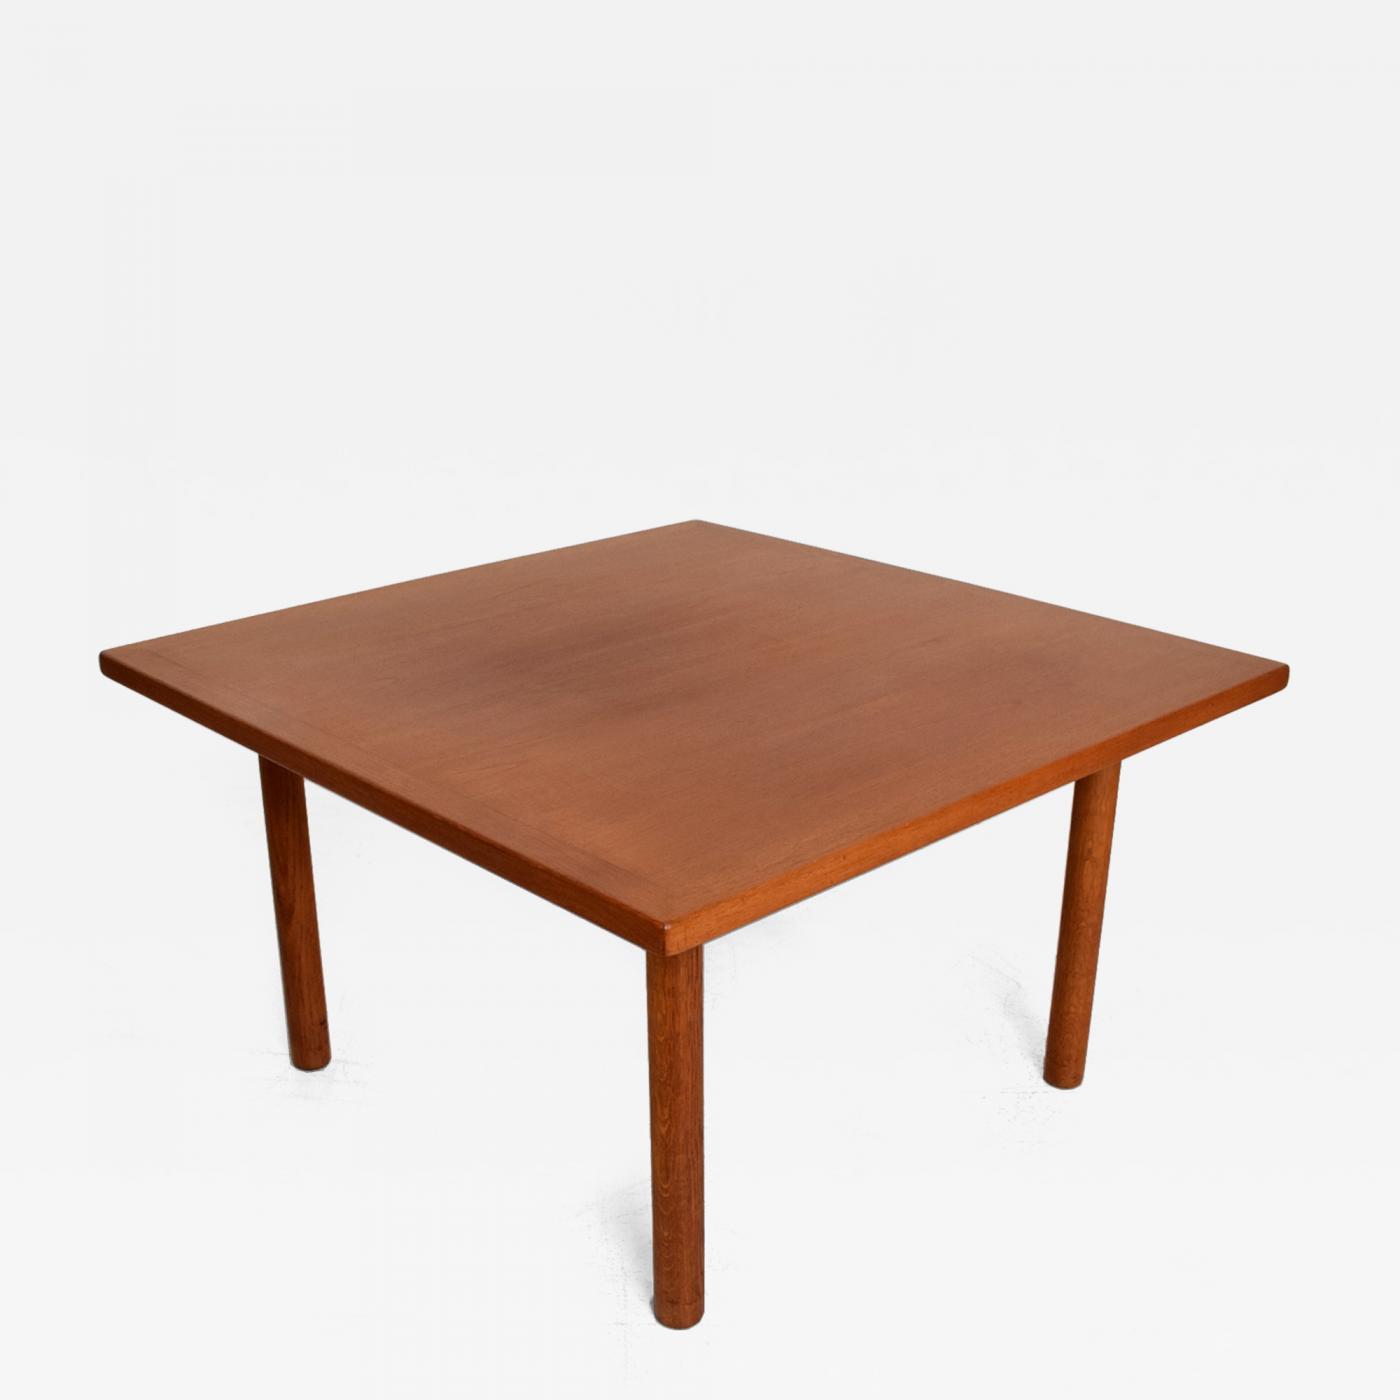 Magnificent Hans Wegner Hans Wegner Teak Oak Coffee Table Mid Century Danish Modern Machost Co Dining Chair Design Ideas Machostcouk